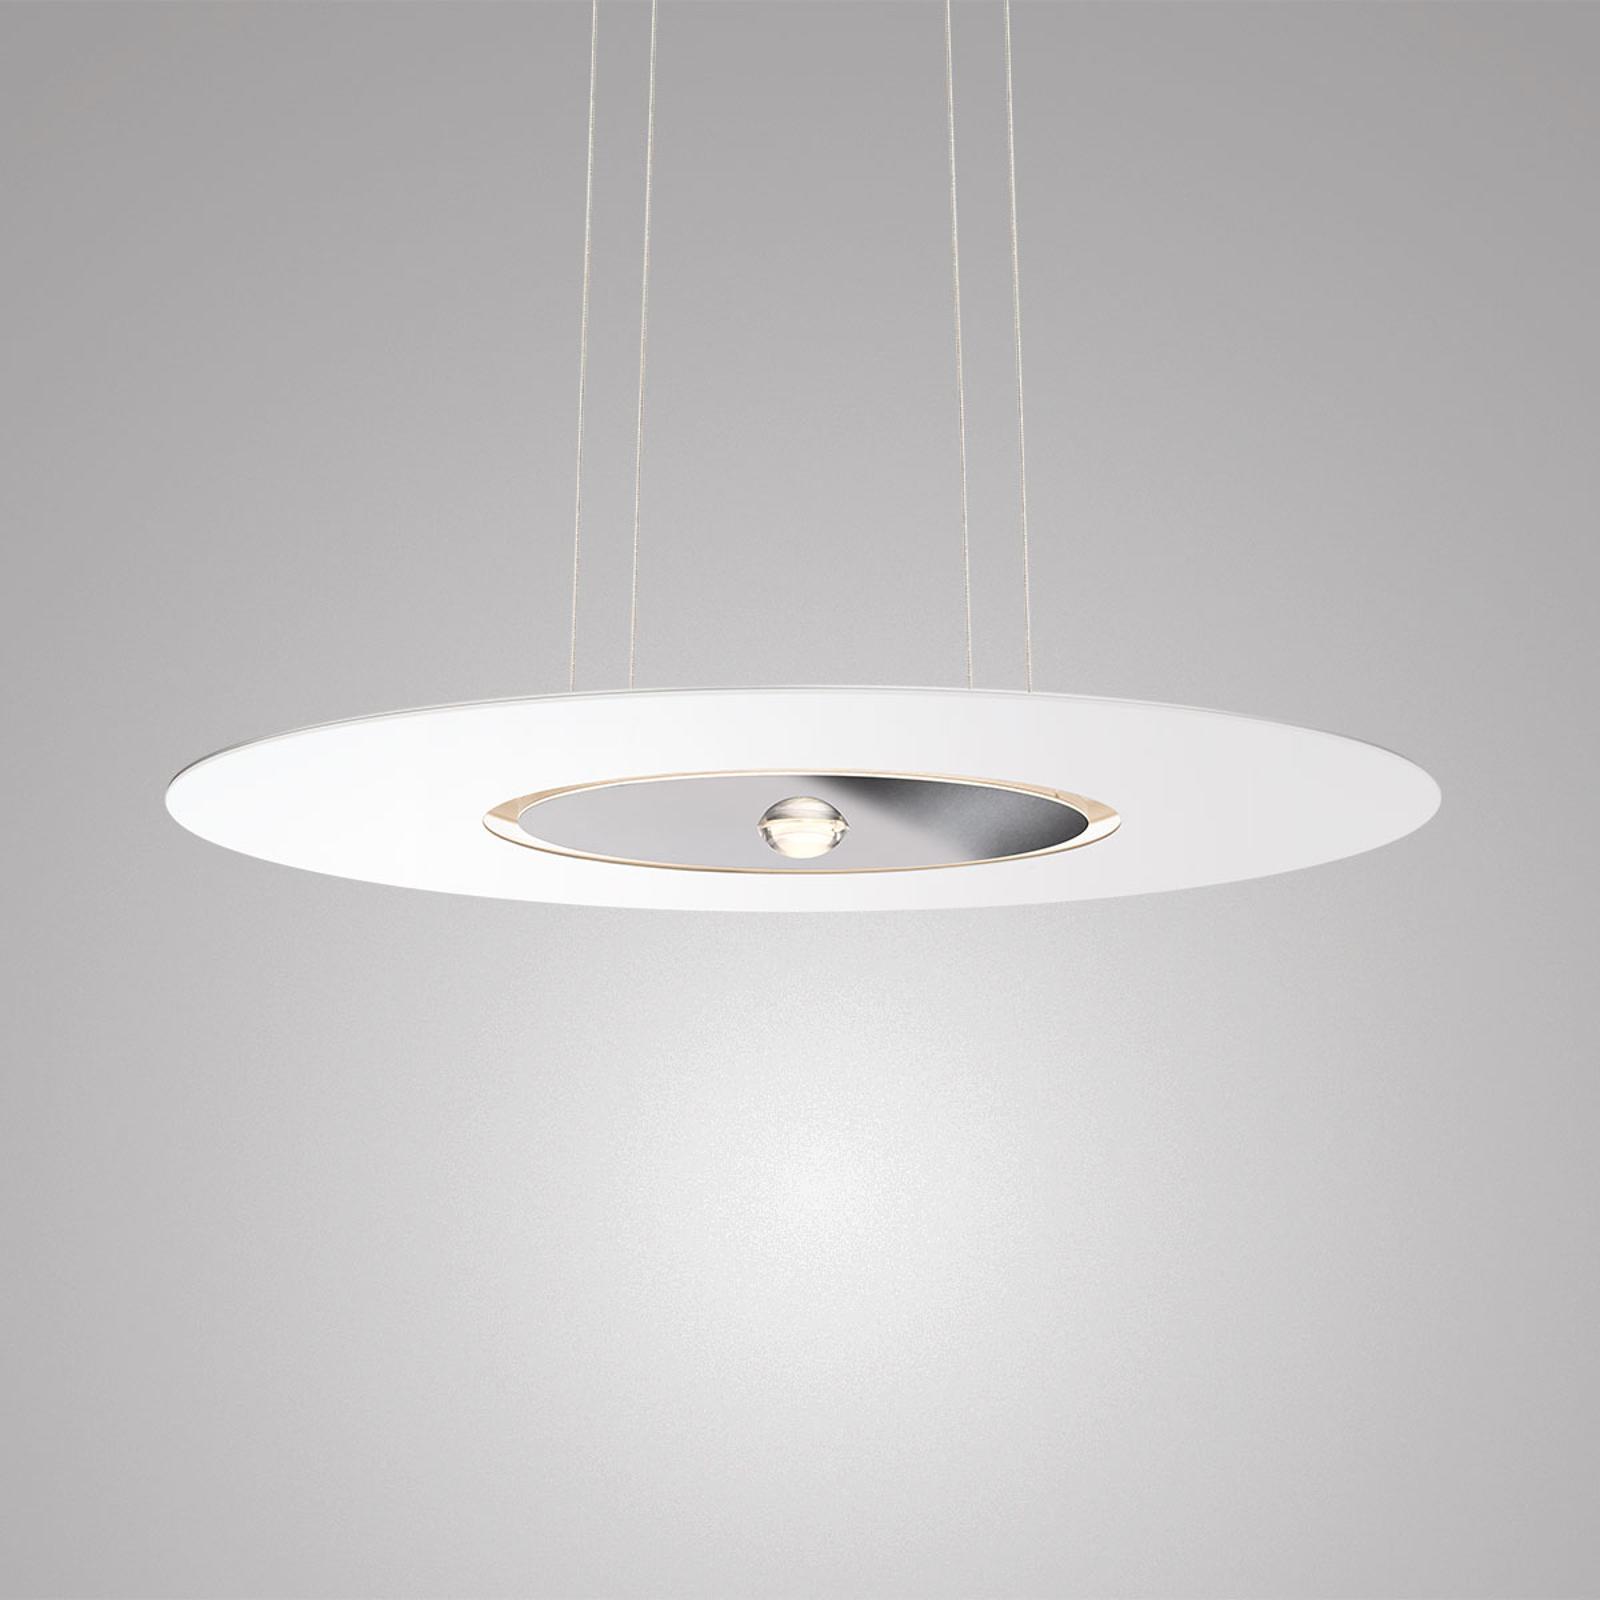 Cini&Nils Passepartout55 LED-Hängeleuchte Casambi kaufen